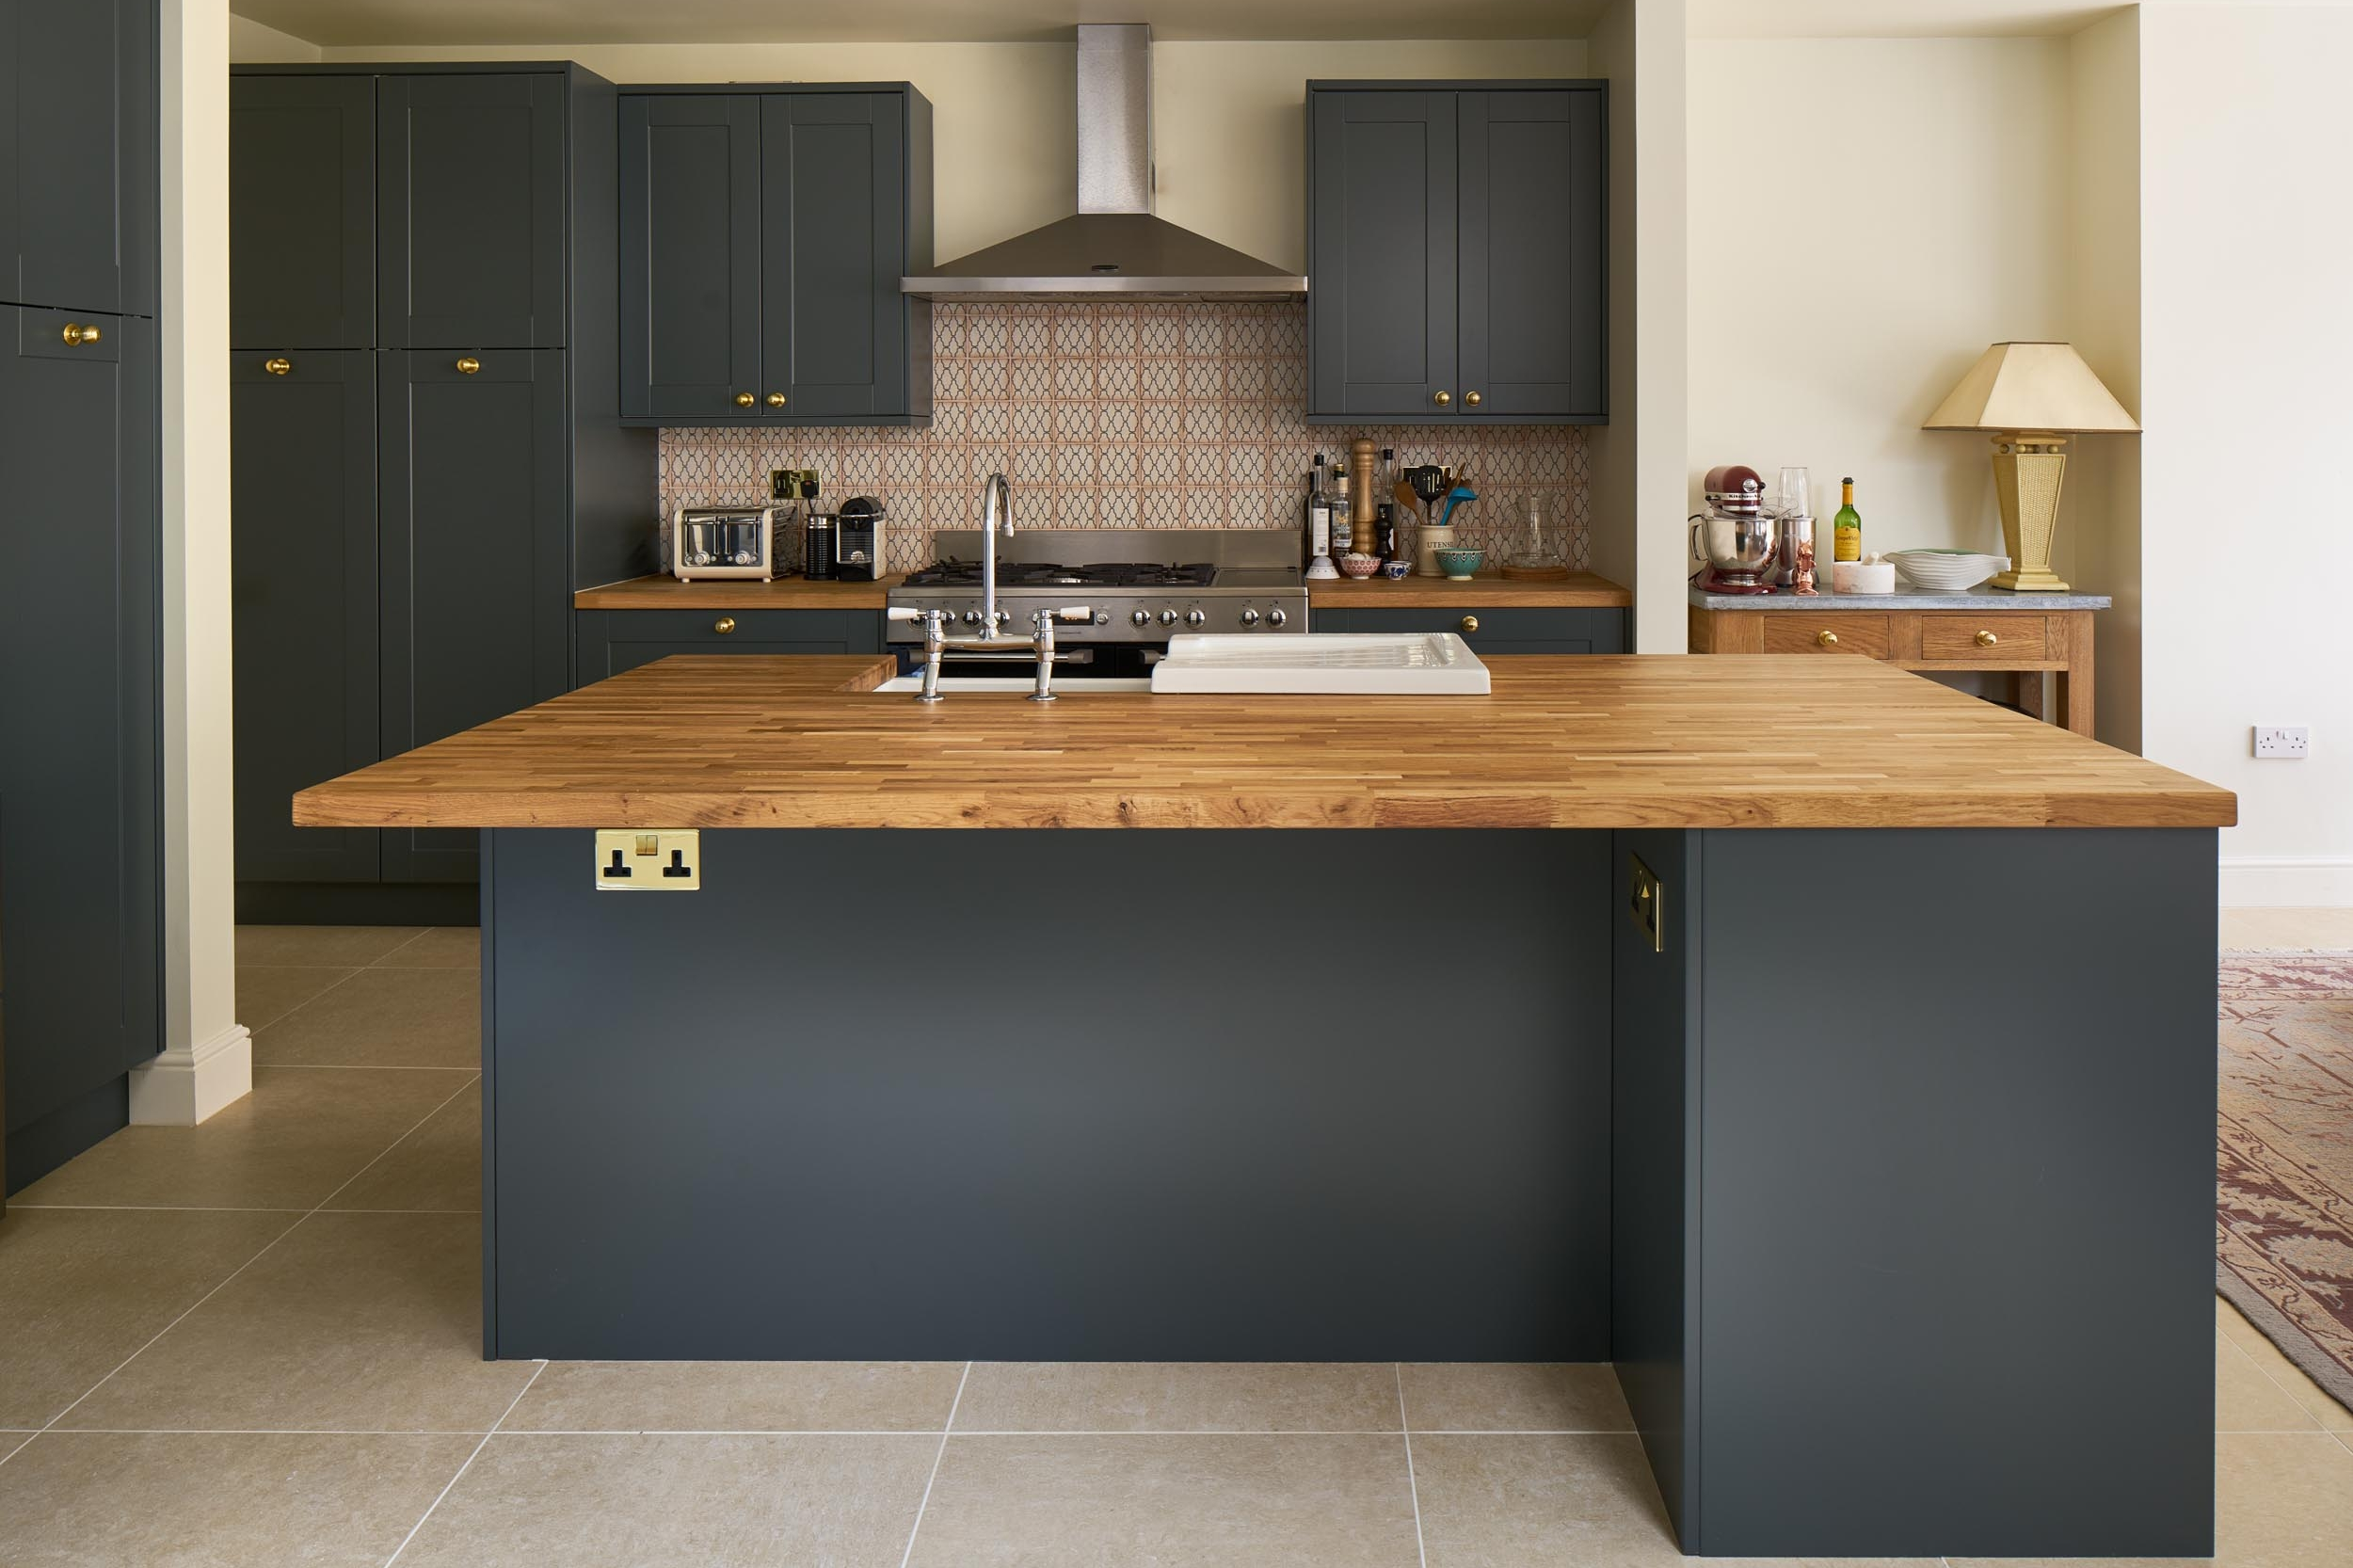 Kitchen - Sedlescombe - RYE Design